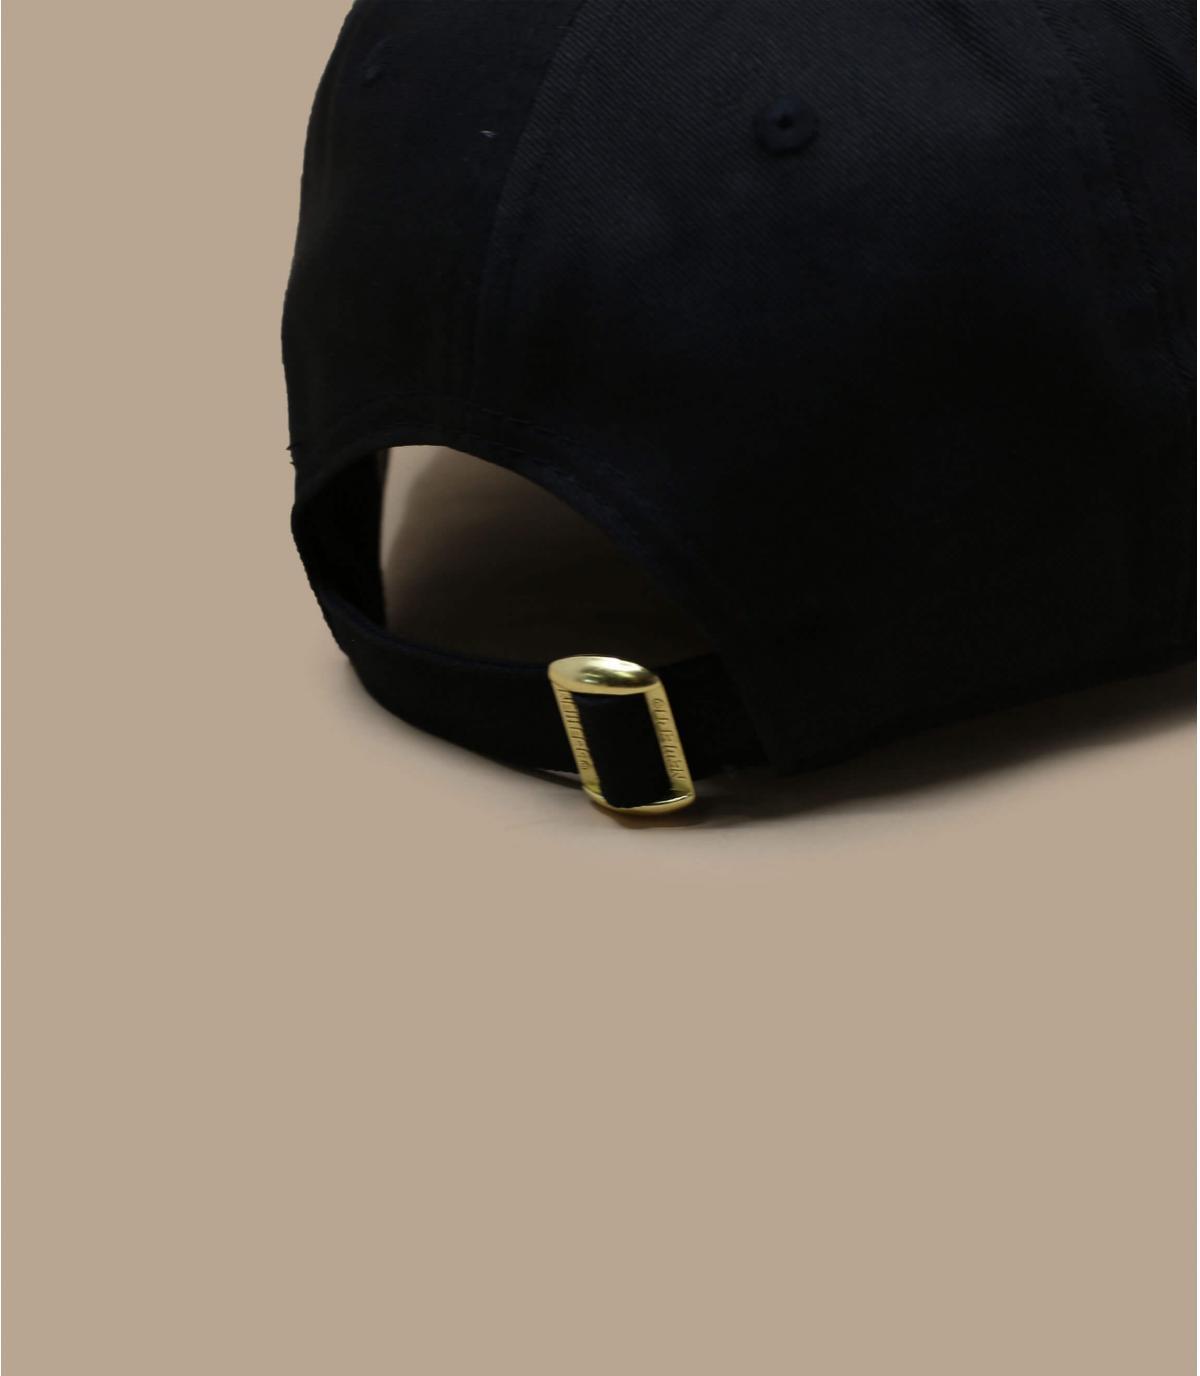 Detalles Metallic Logo 940 LA black gold imagen 4